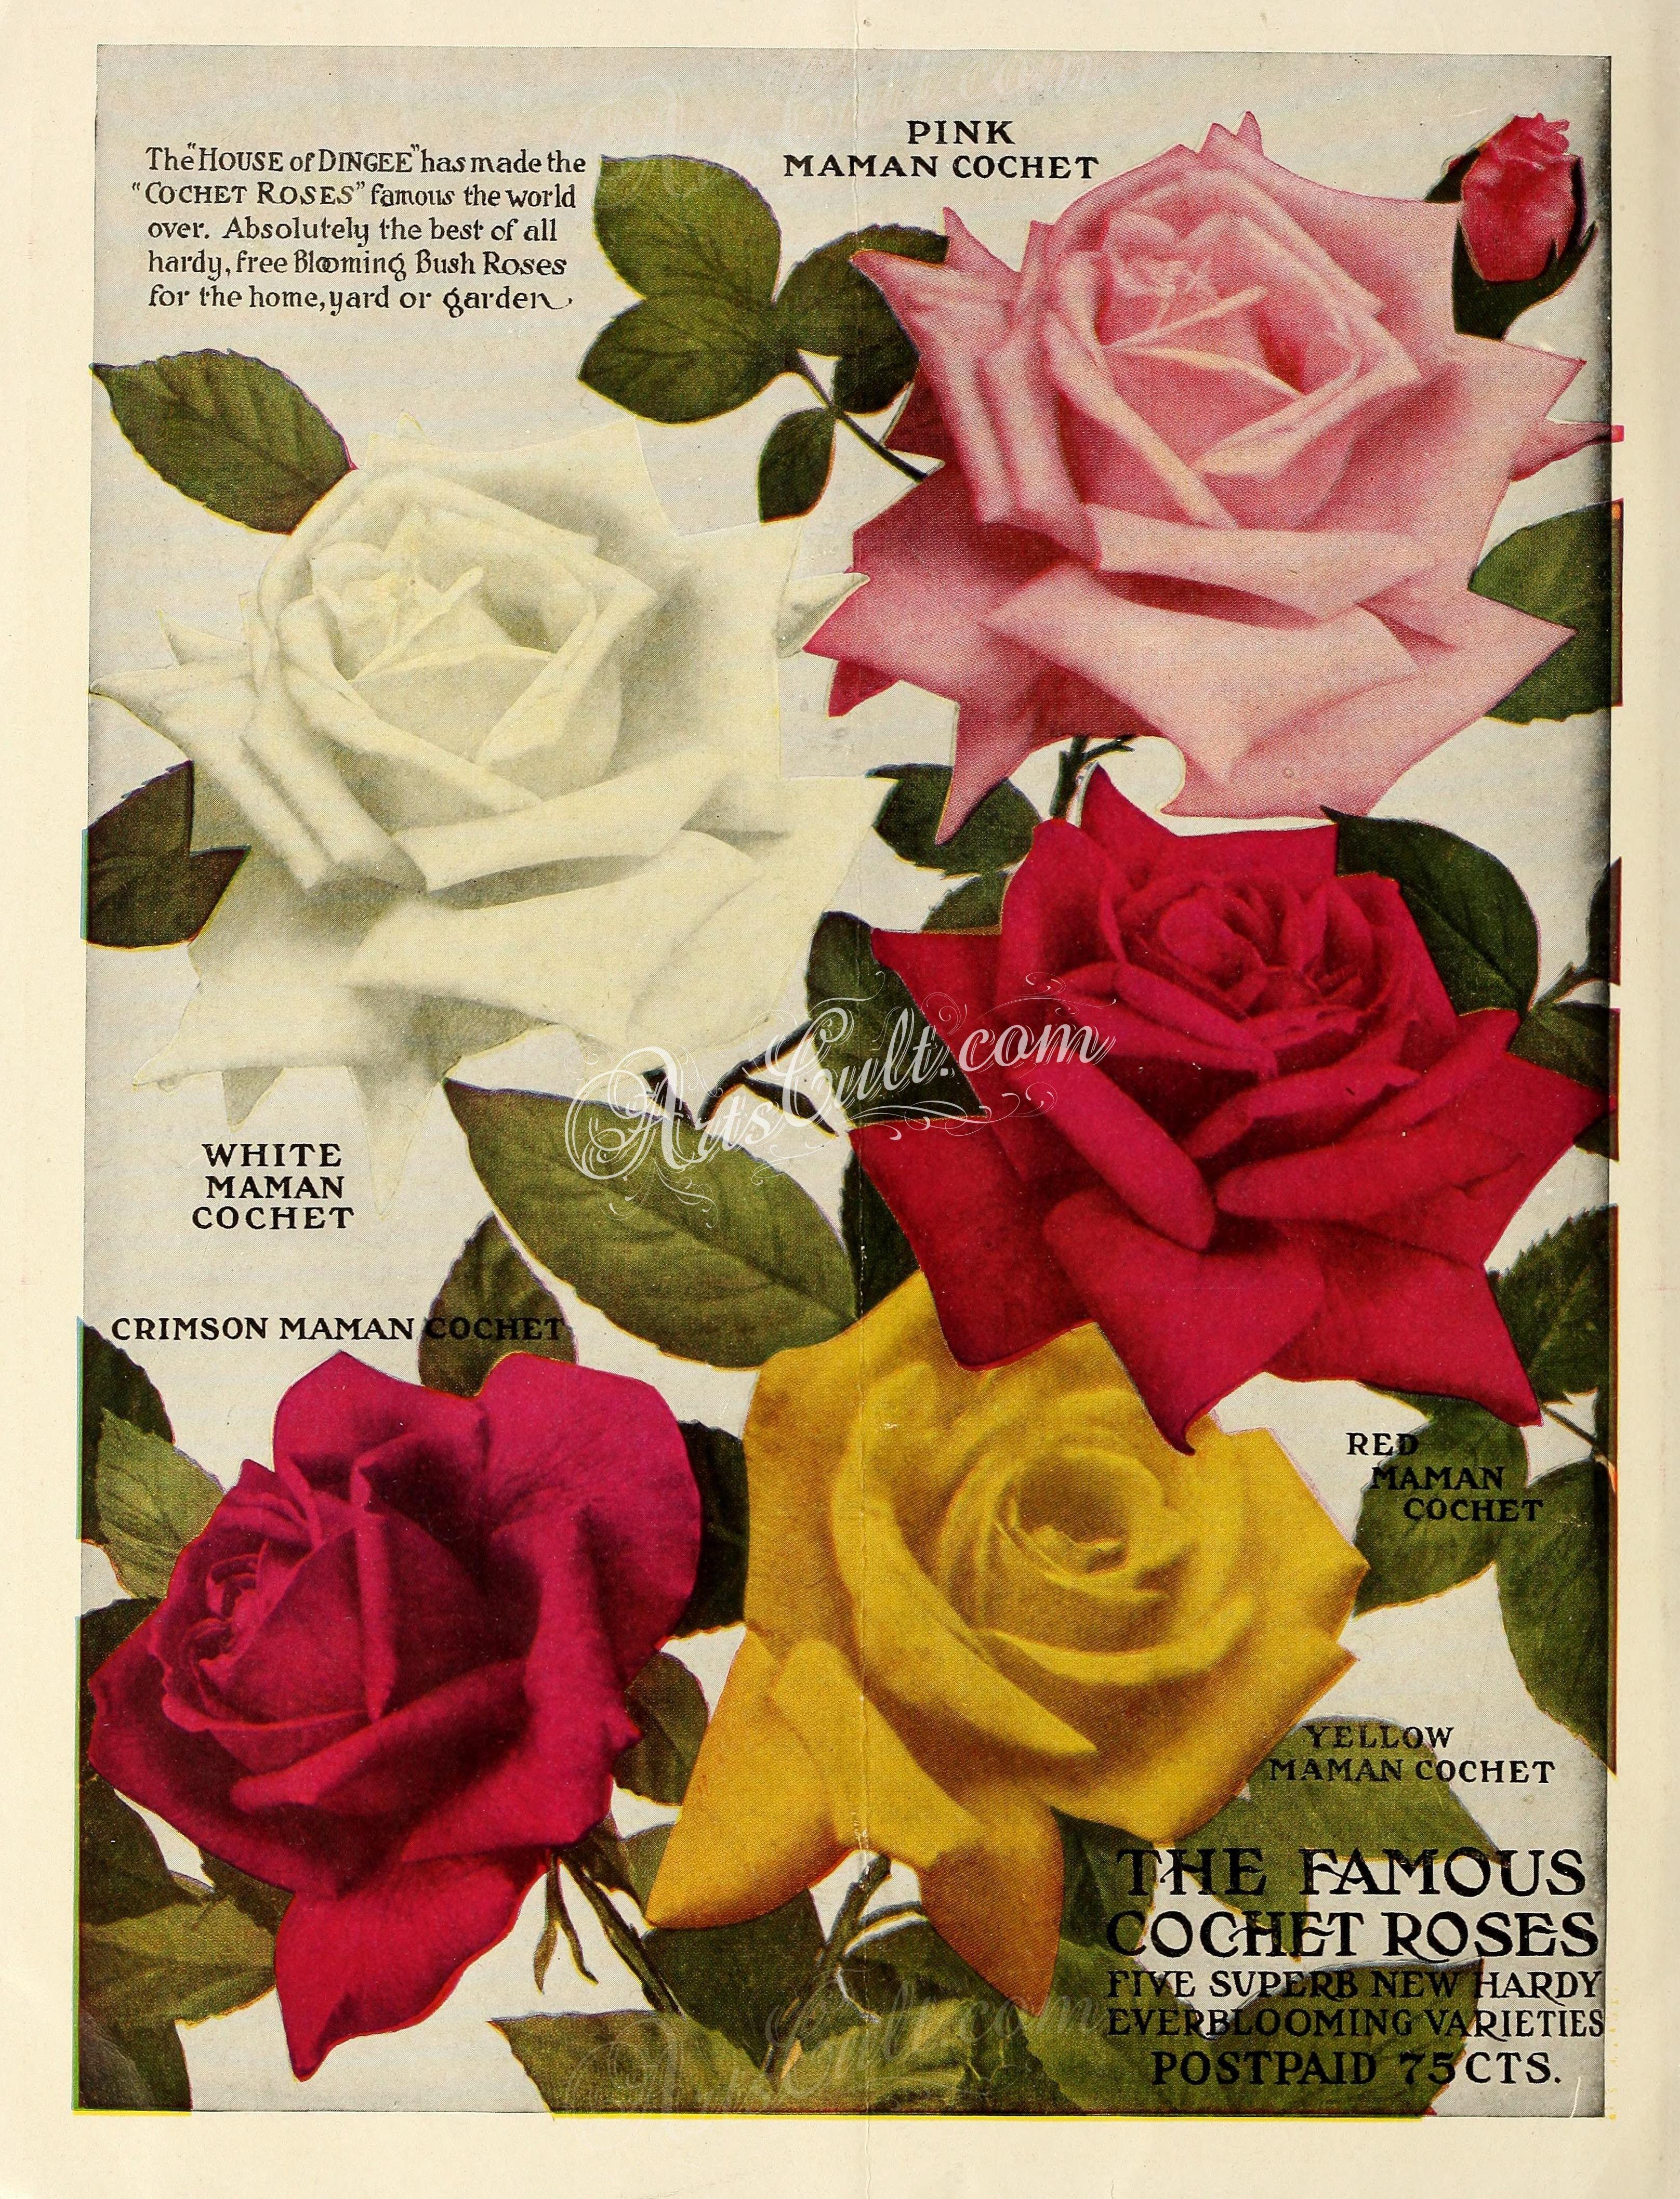 Seeds Catalogs 01623 053 Rose Botanical Fl Botany Natural Naturalist Nature Flowers Flower Beautiful Nice